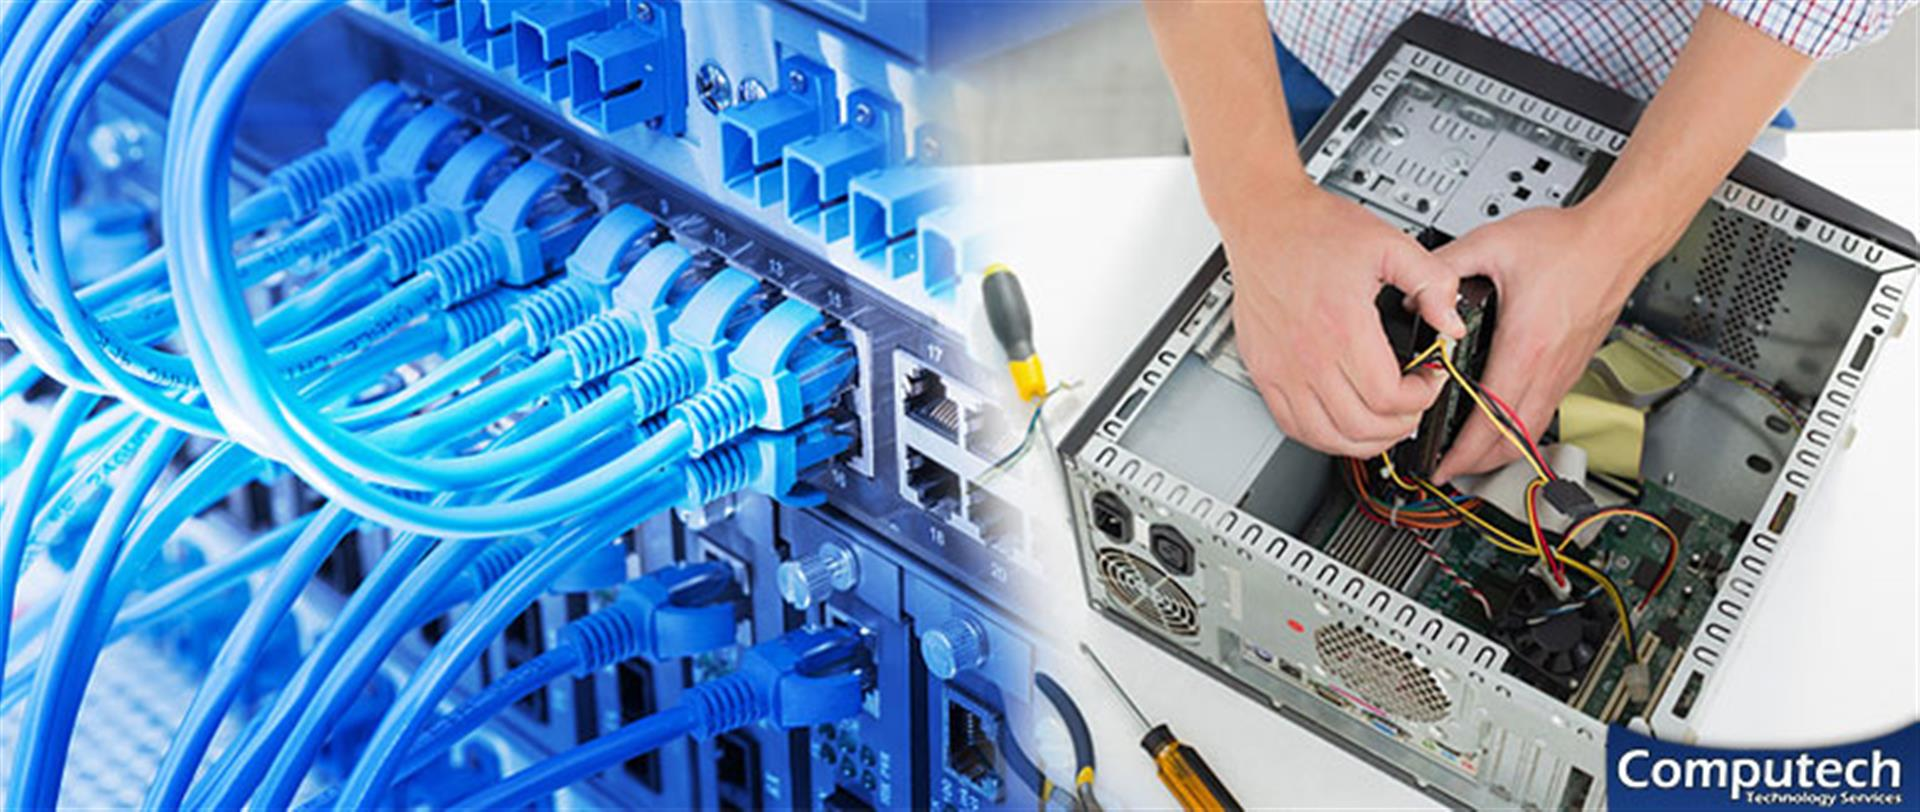 Clanton Alabama Onsite PC & Printer Repairs, Network, Telecom & Data Wiring Services